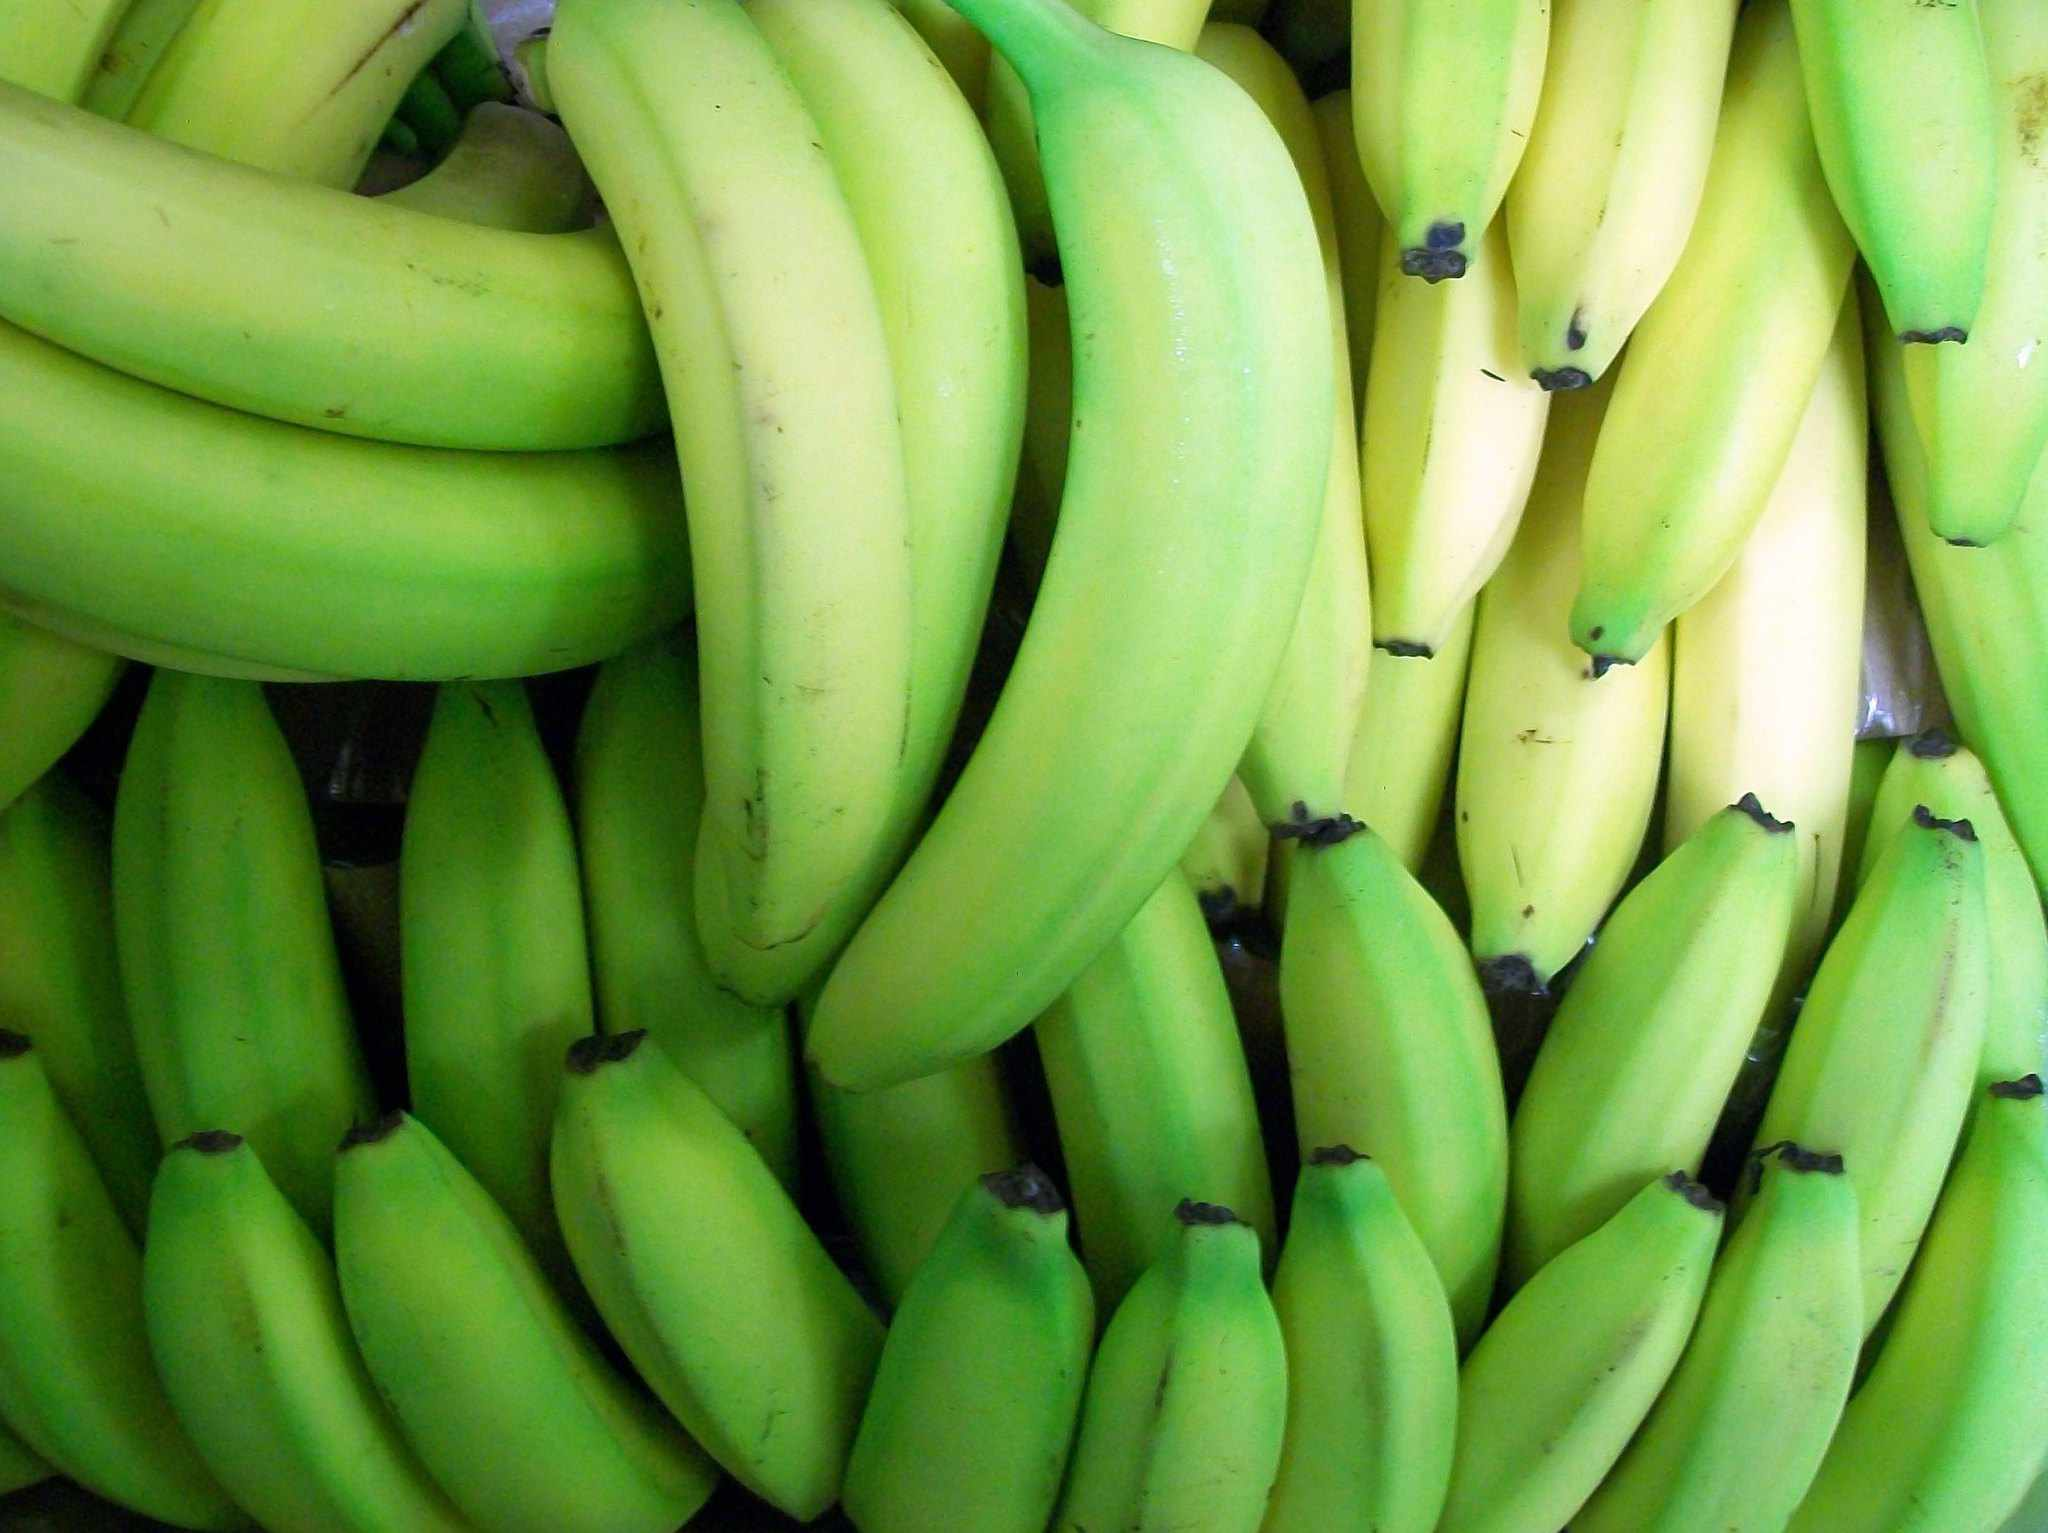 Several bunches of green bananas